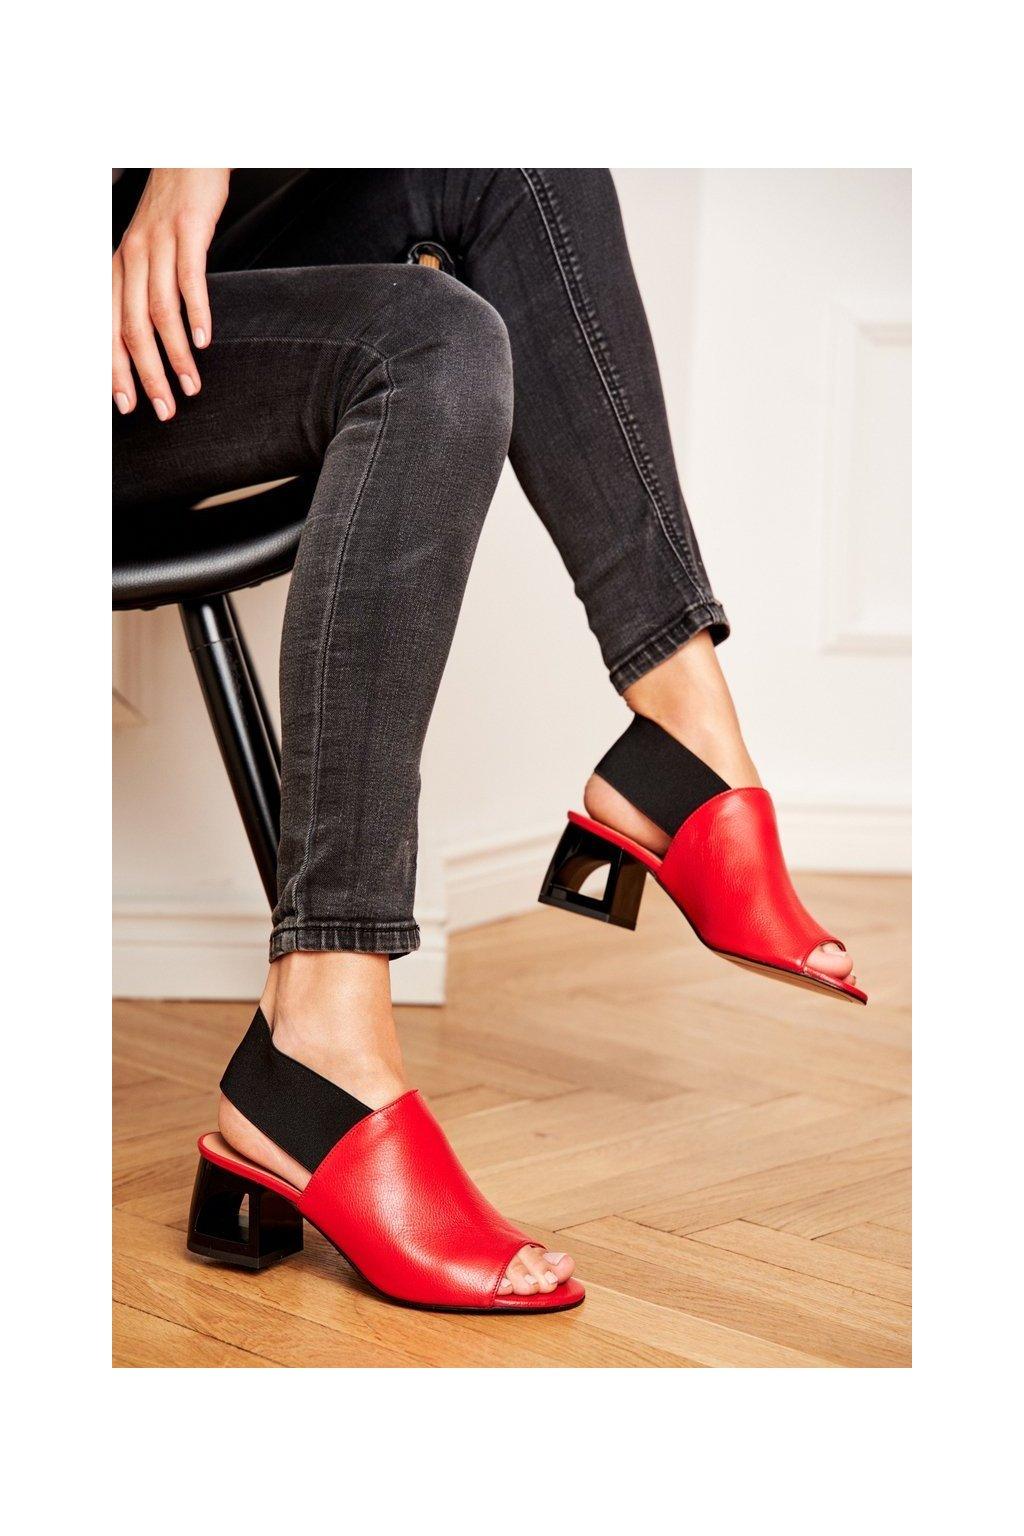 Dámske sandále na podpätku farba červená kód obuvi 1919 916 RED